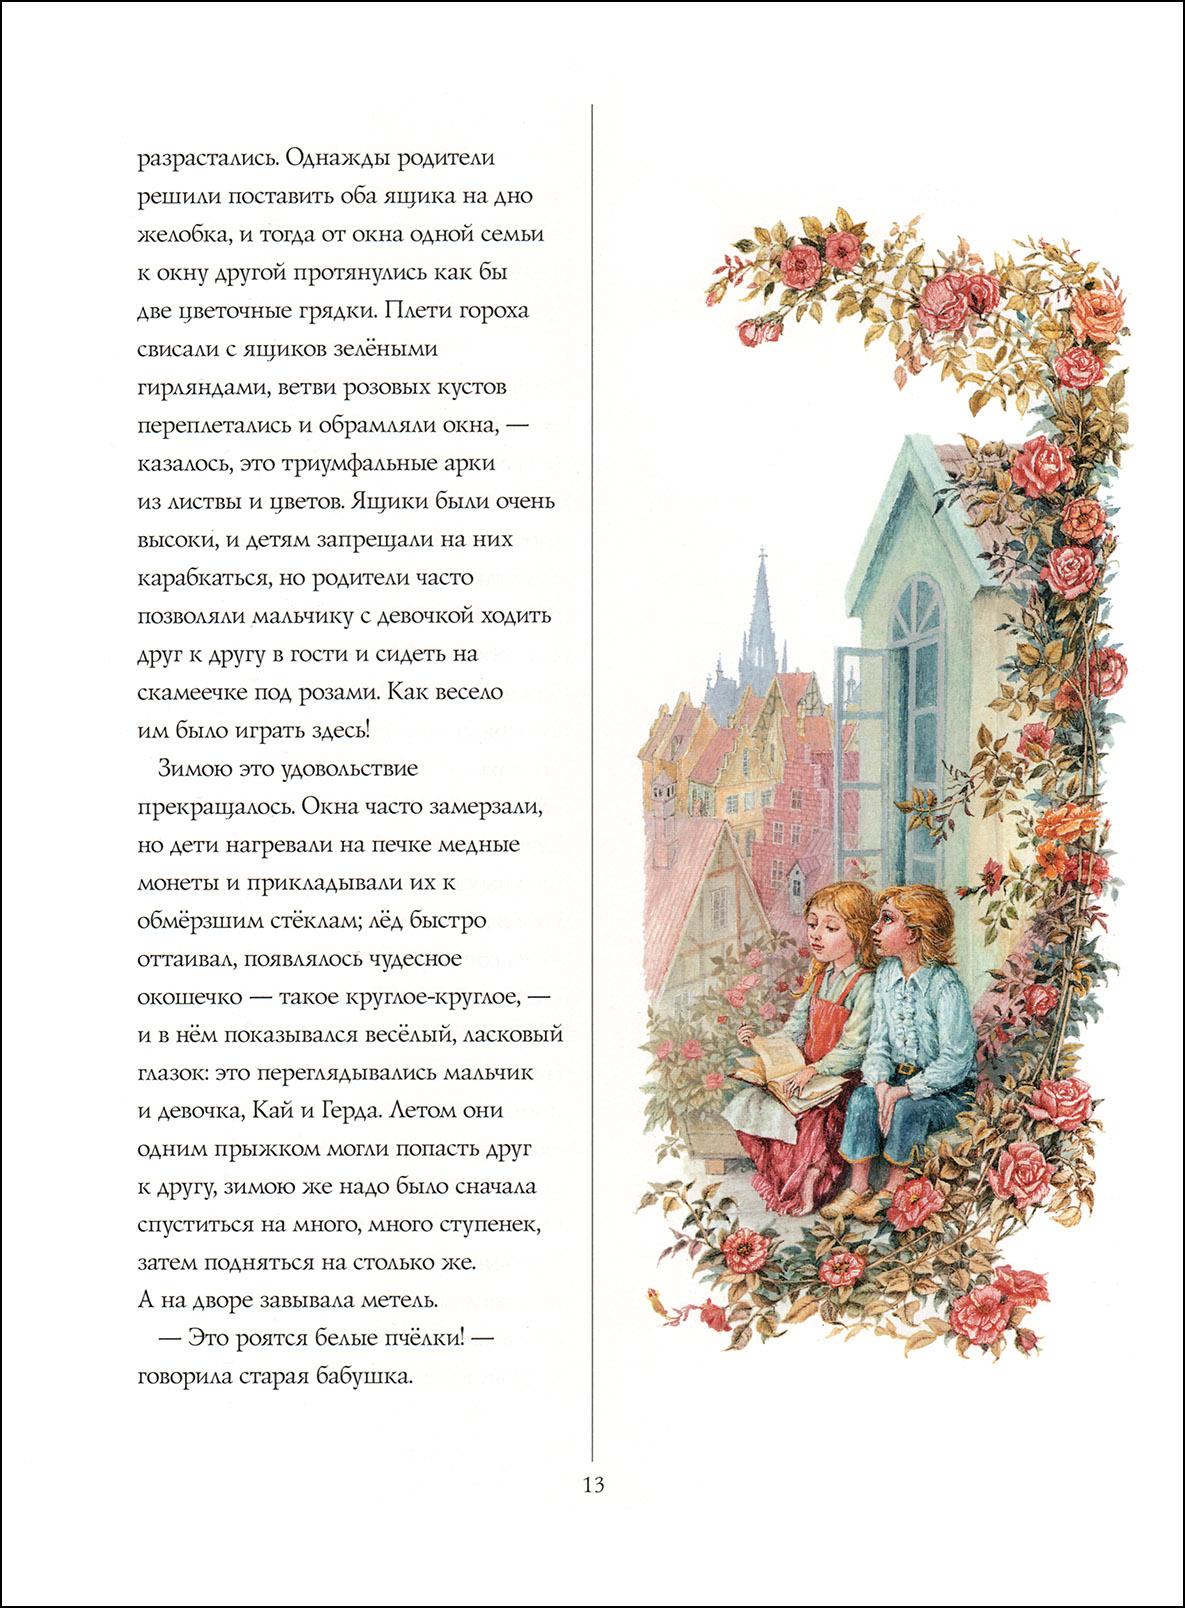 Борис Диодоров, Снежная королева